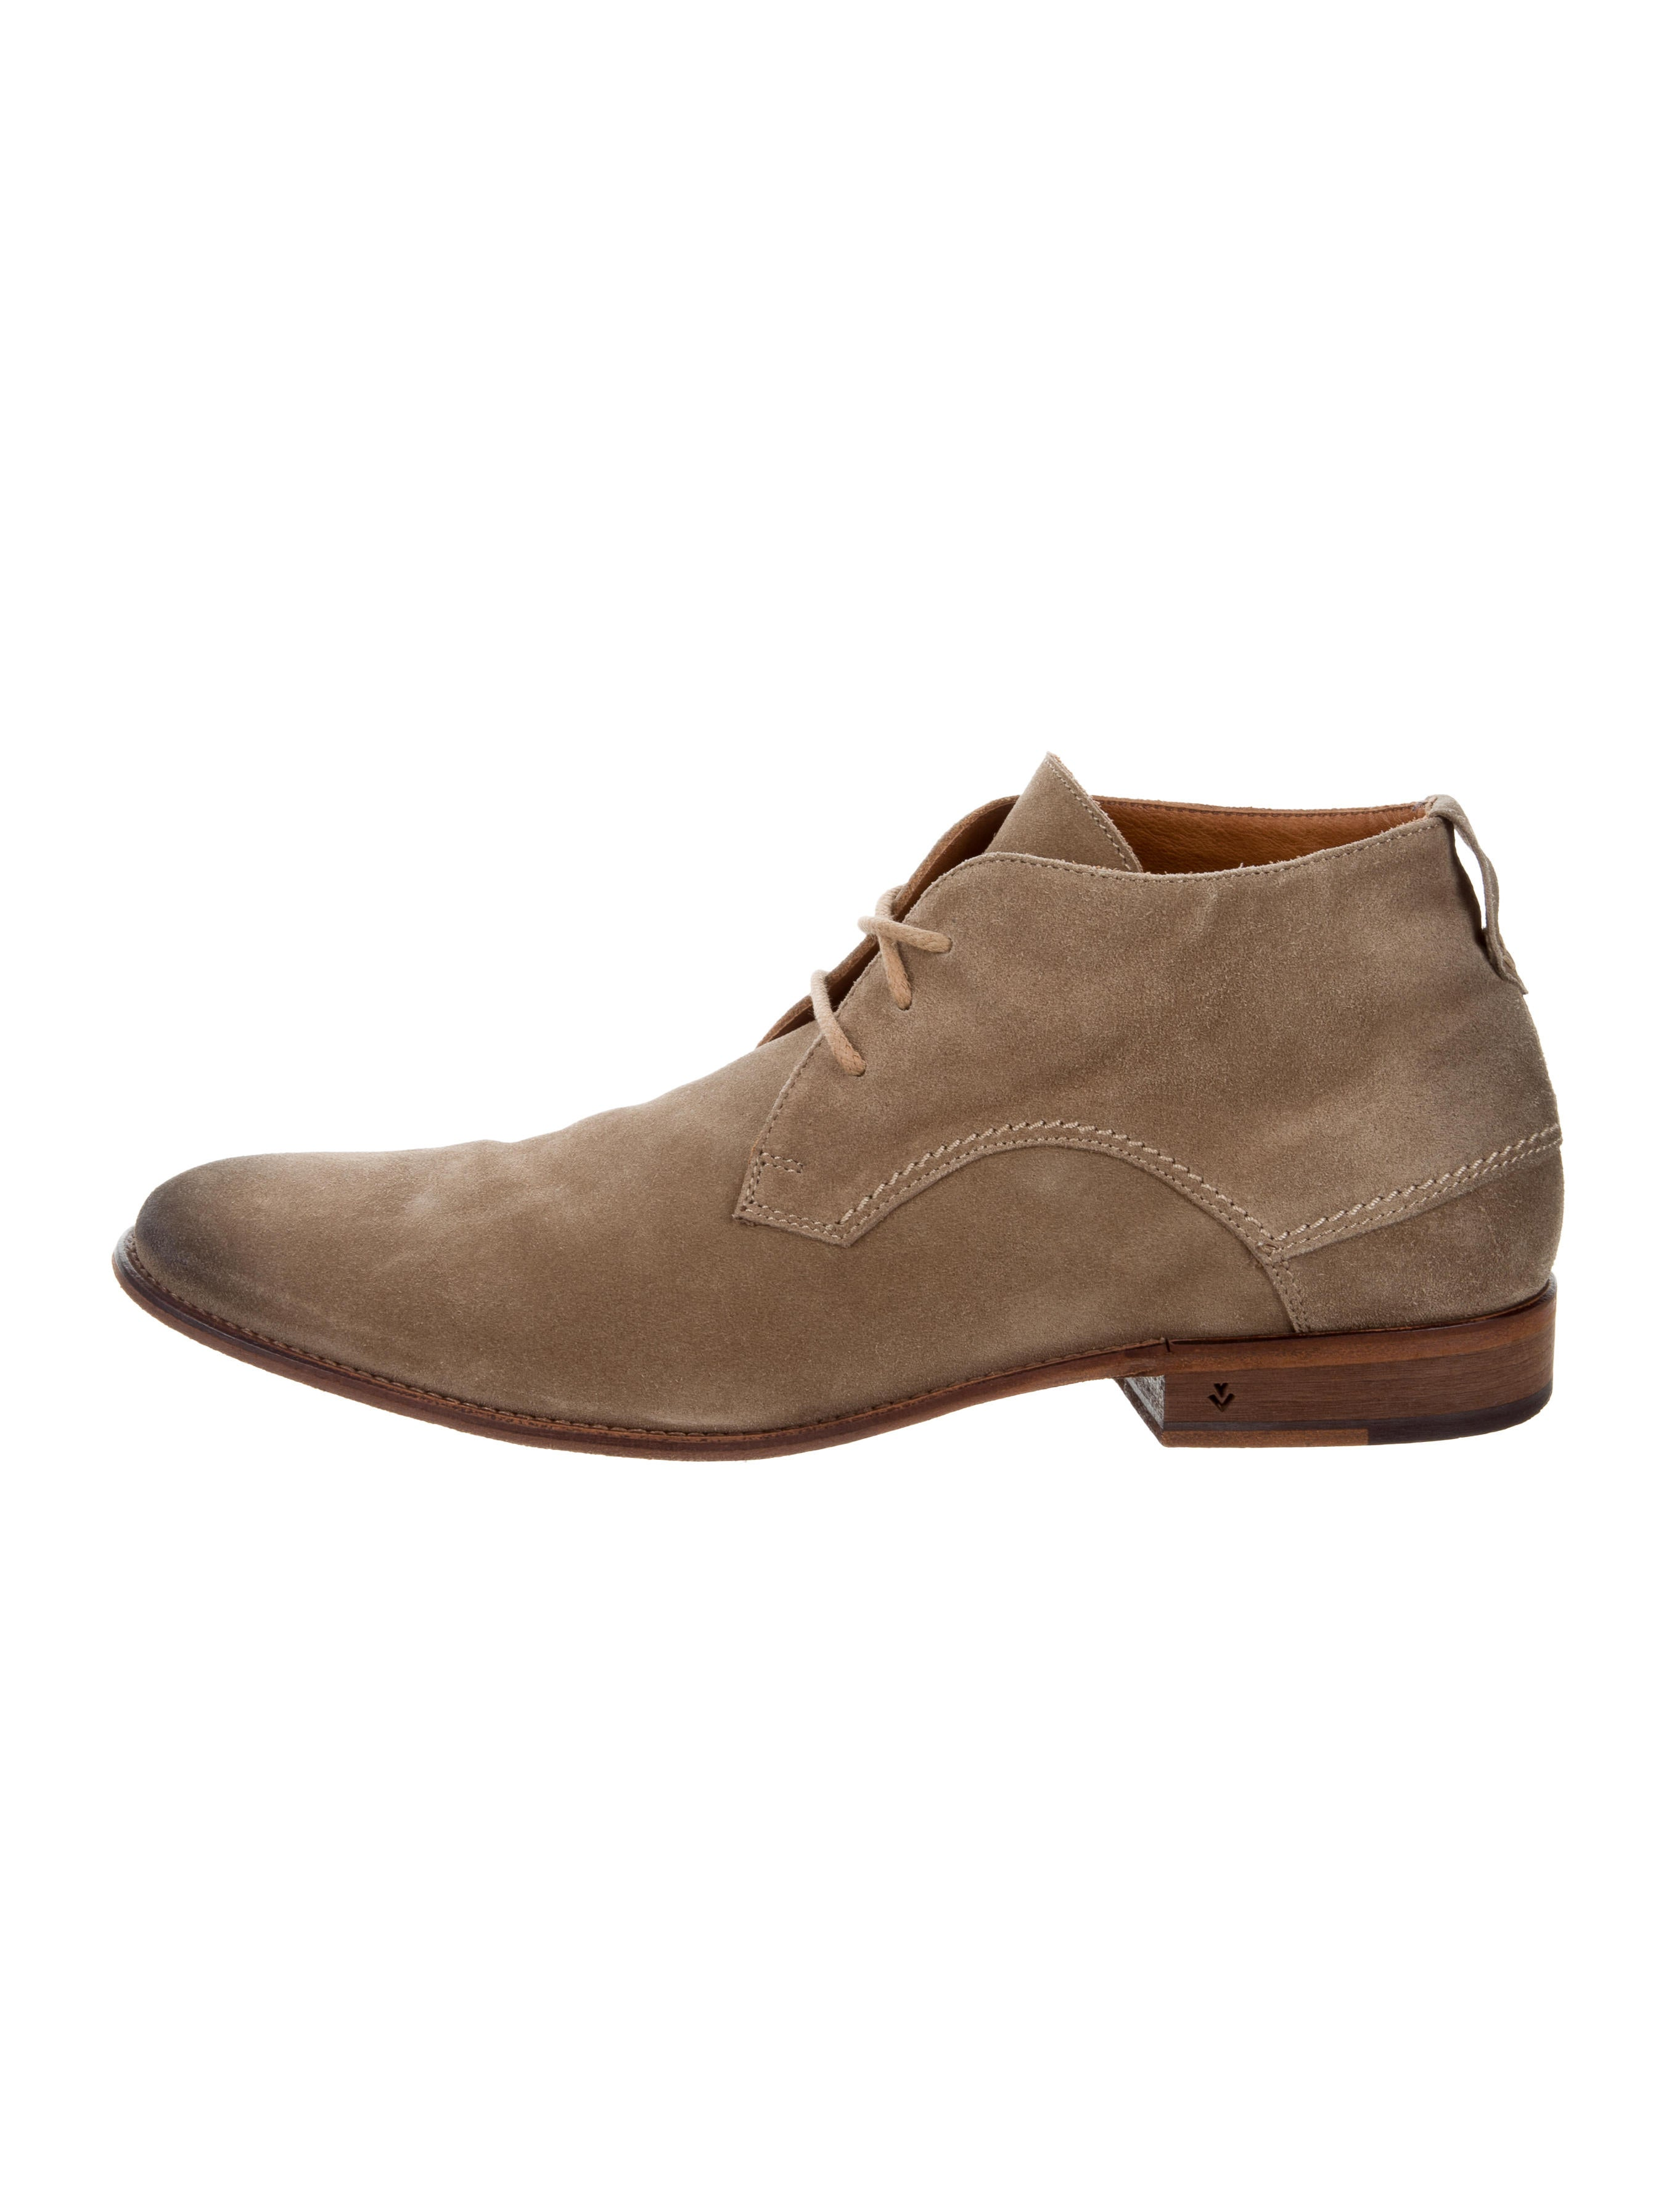 varvatos suede desert boots shoes jva24159 the